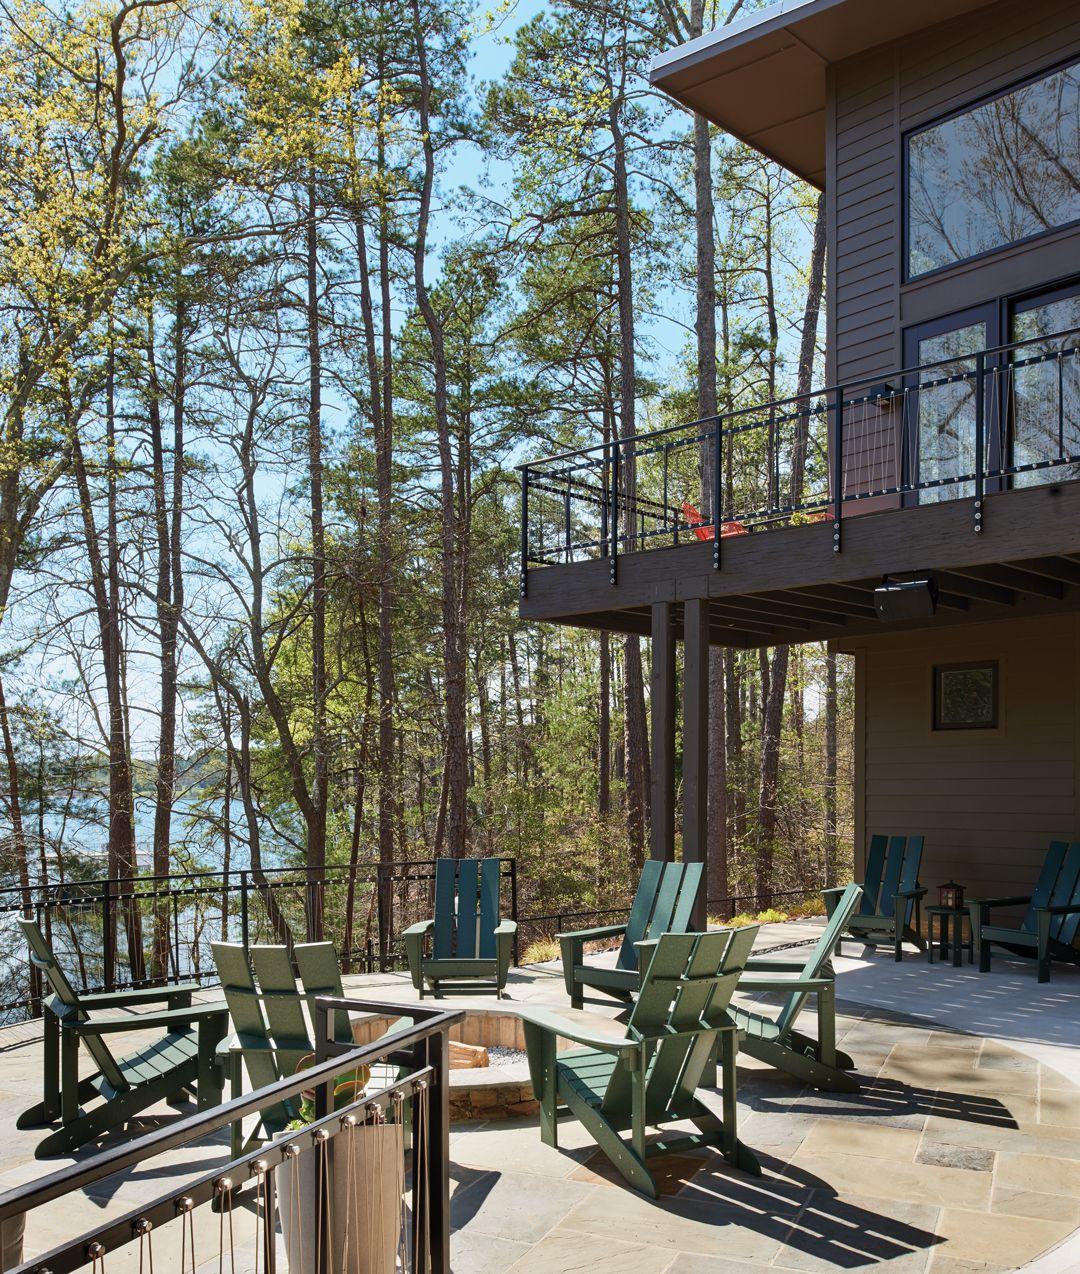 Beautiful Lake House Decor Inspiration: Summer Escape: Inside Three Beautiful Southern Lake Houses